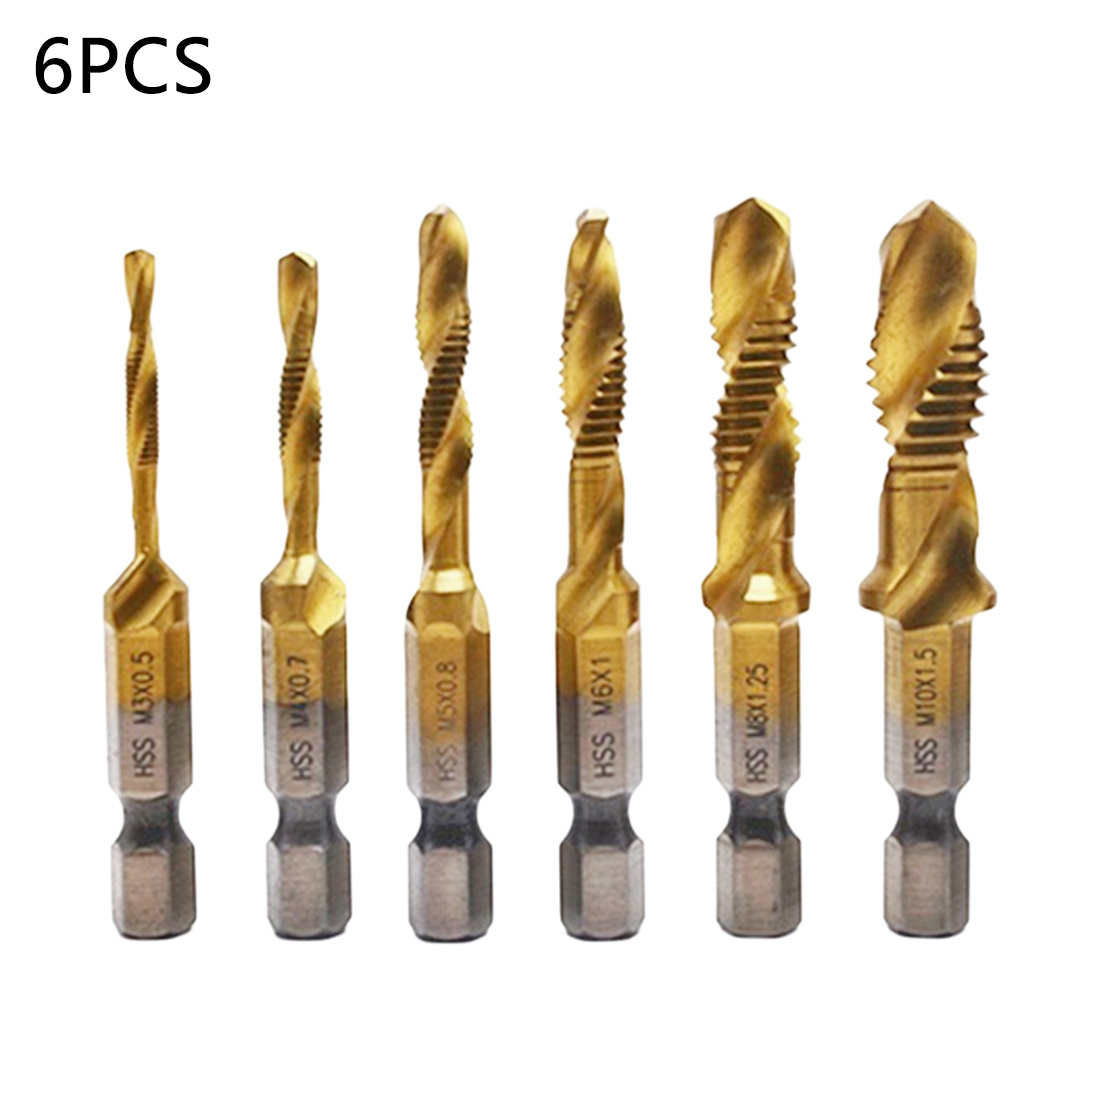 "6pcs M3 M4 M5 M6 M8 M10 HSS Drill Bit Tap HSS Drill Bits Metric Thread Spiral Screw1/4"" Hex Shank Bits Set Power Tools"